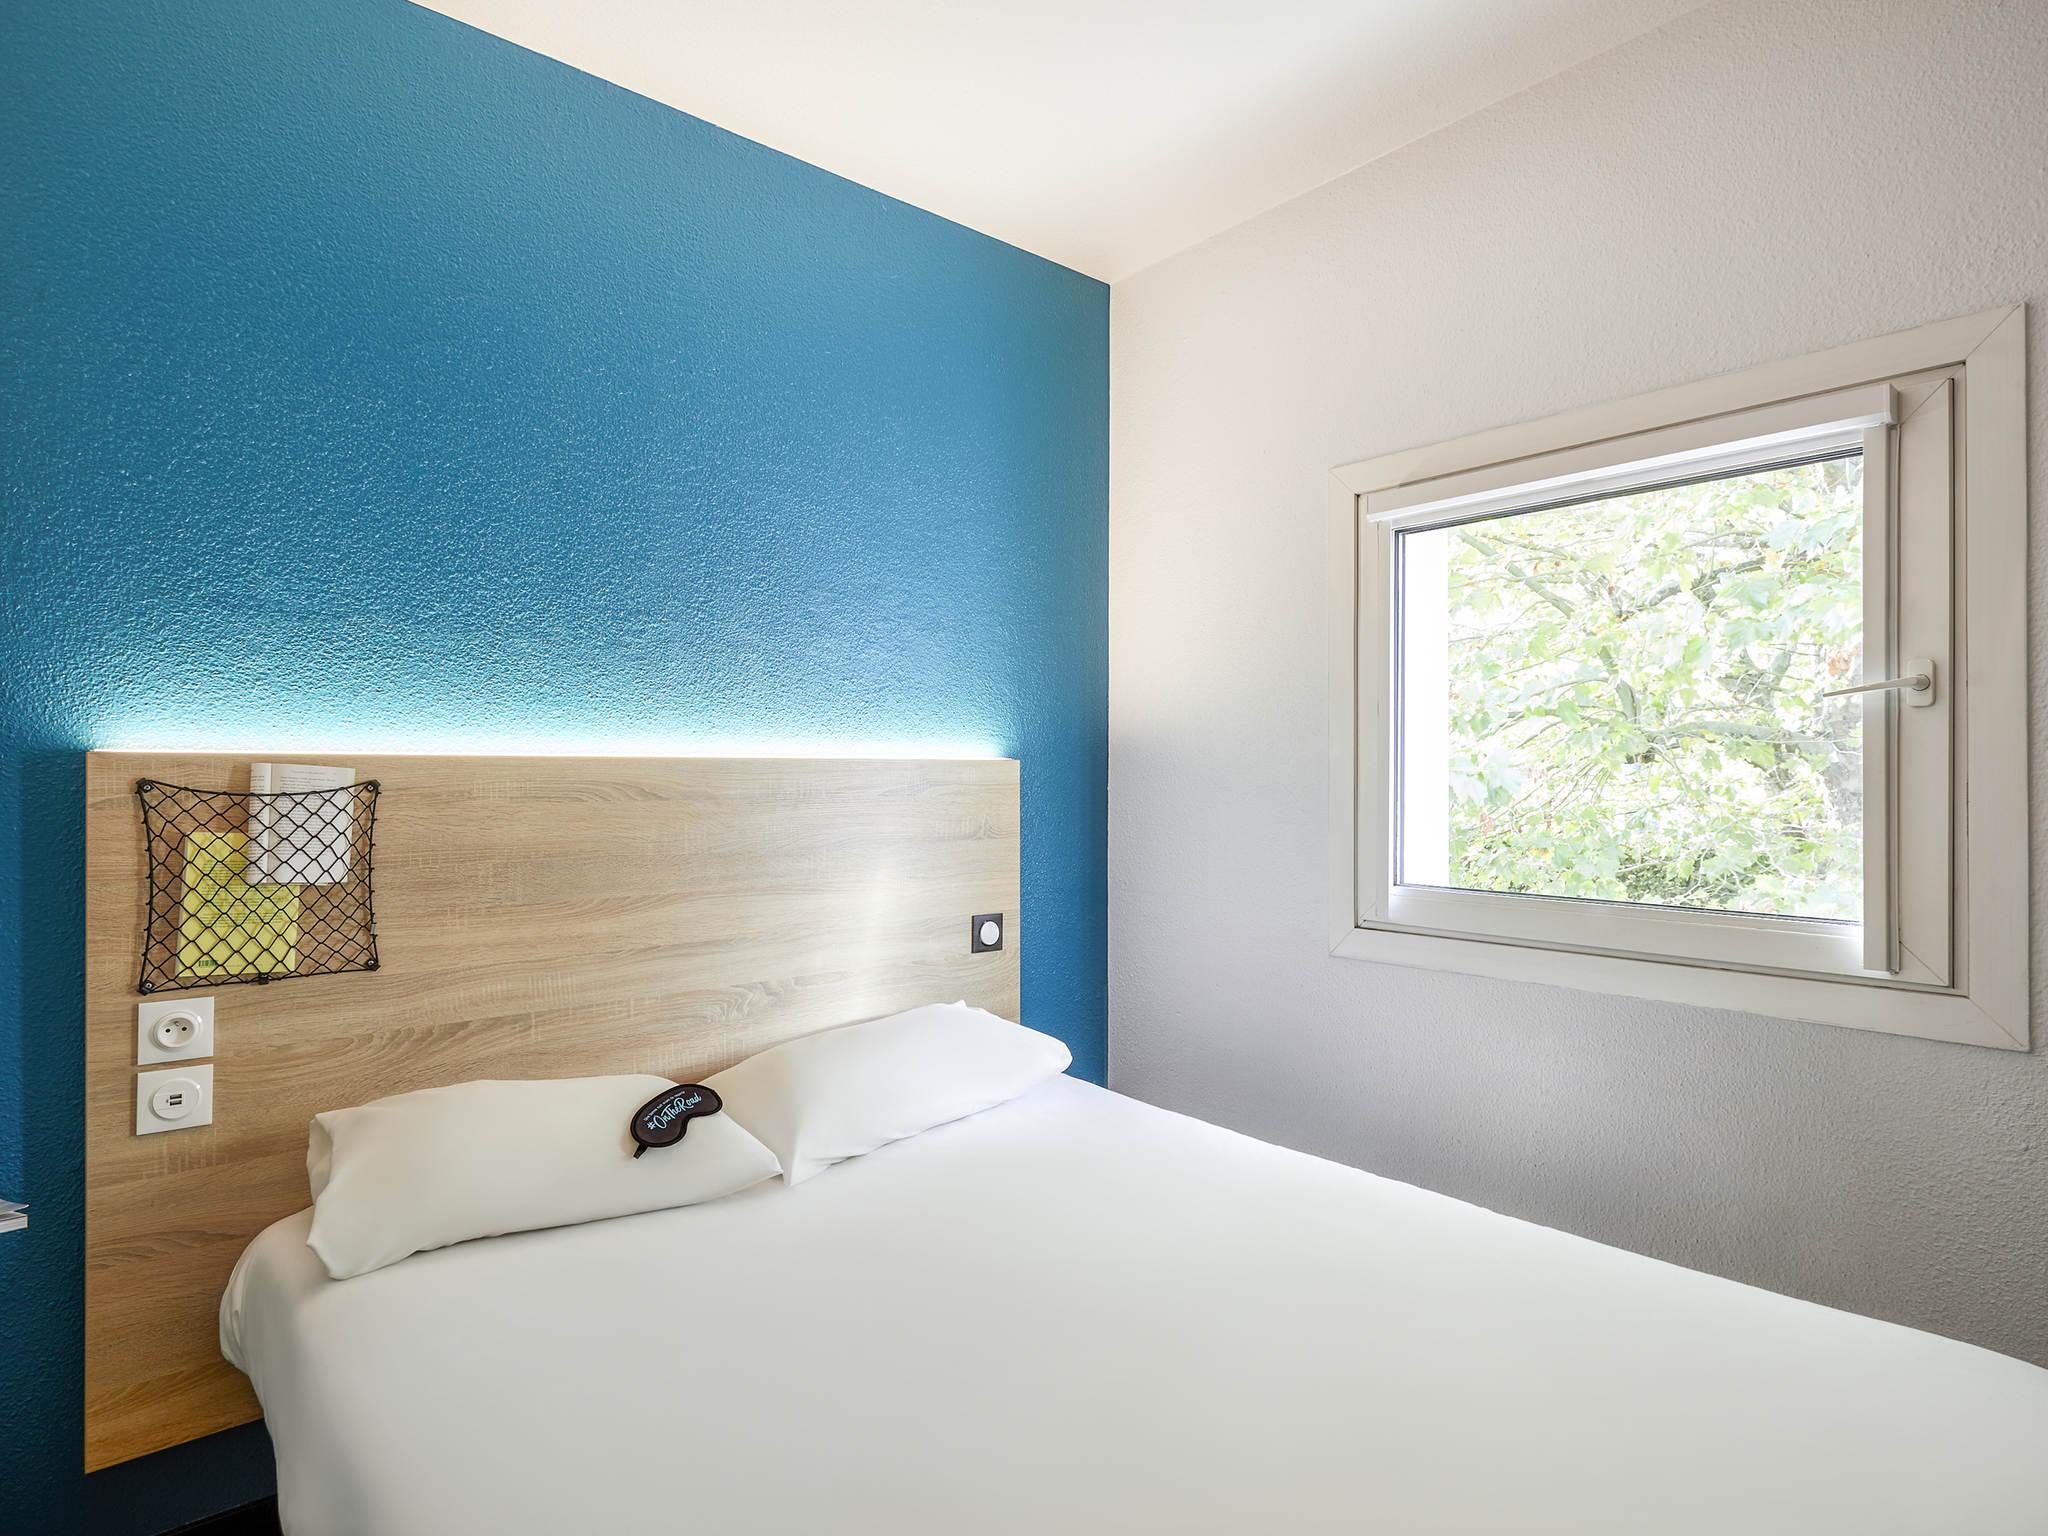 Otel – hotelF1 Lyon Saint-Priest (rénové)